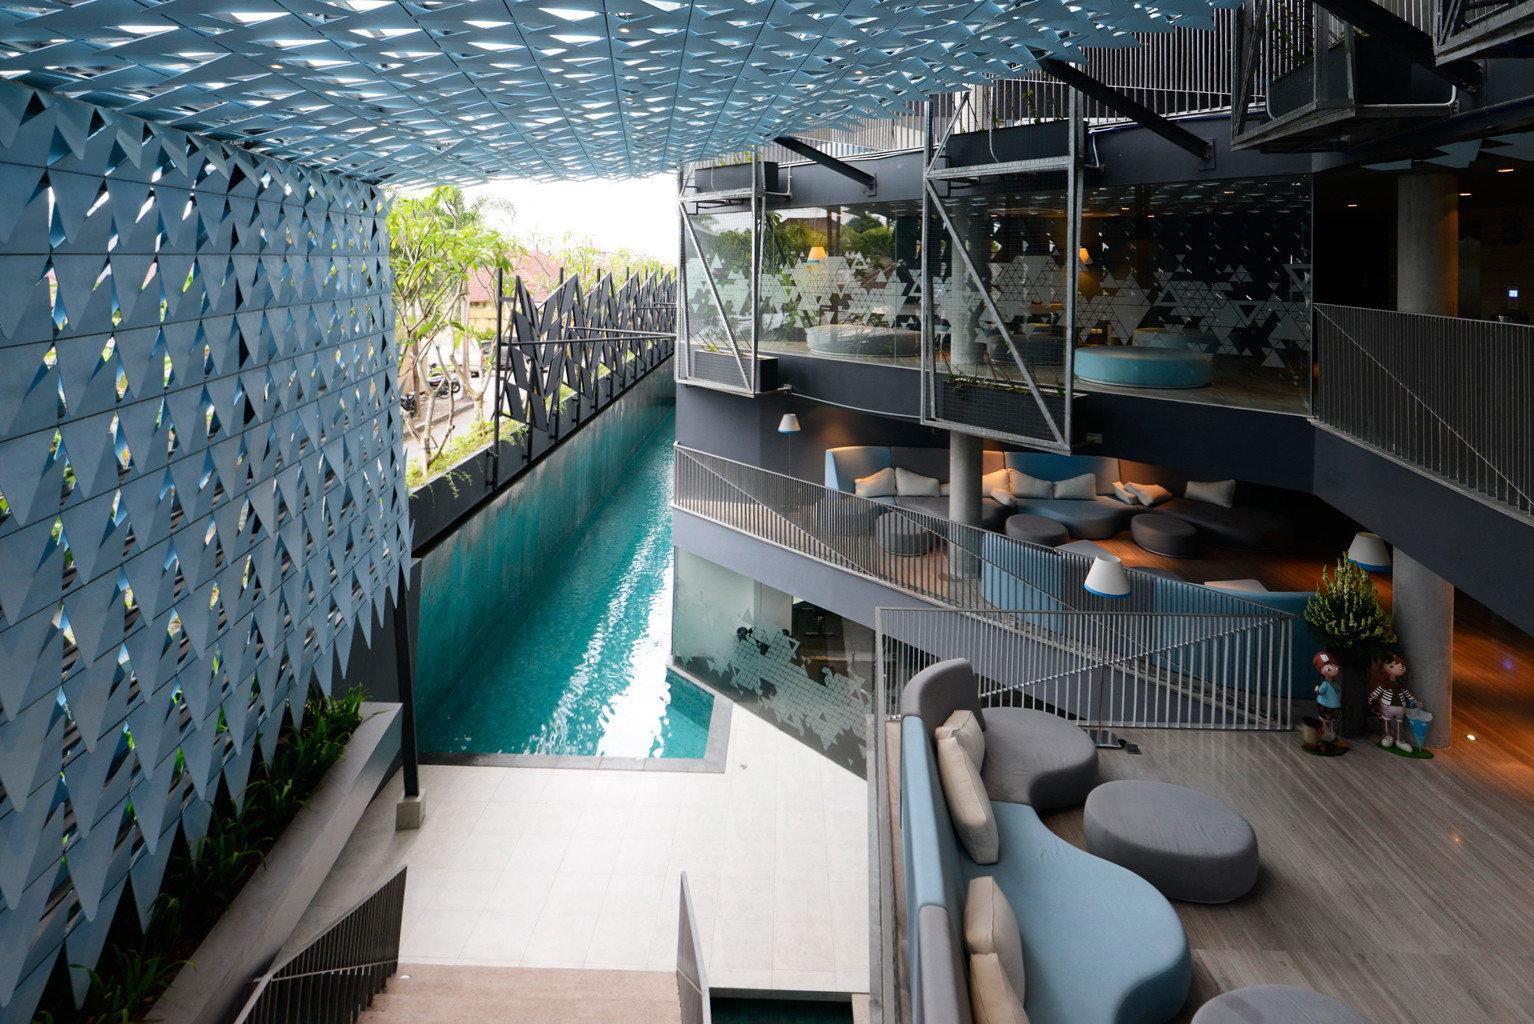 Bar Dining Drink Eat Pool Scenic views Architecture condominium swimming pool